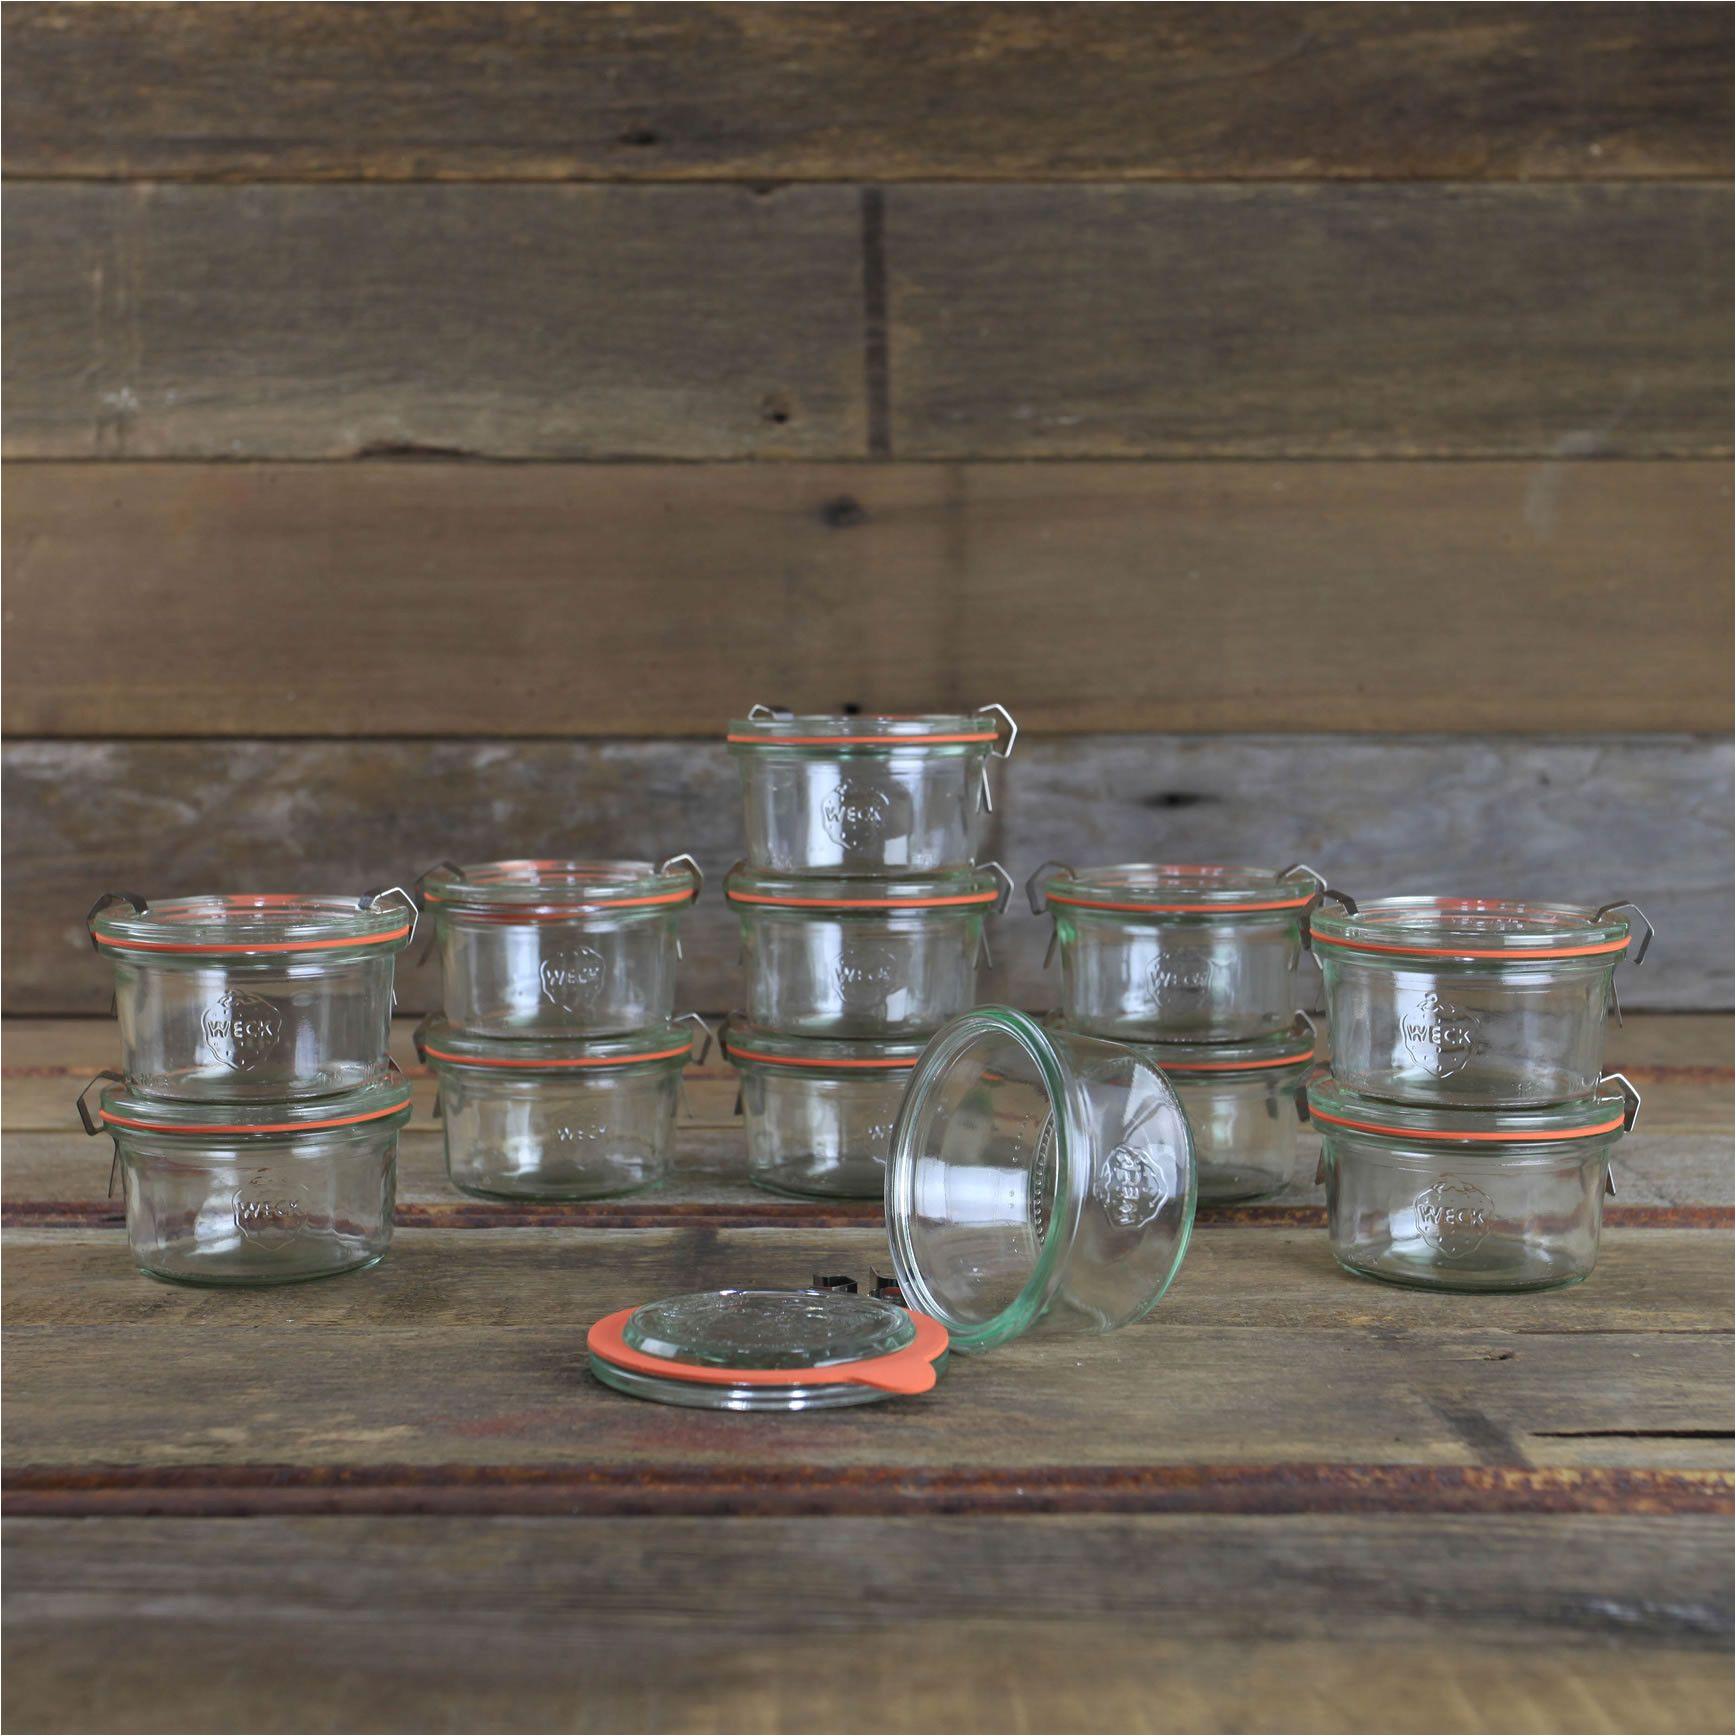 weck mold jars mini 5 6 oz case of 12 glass jars 976